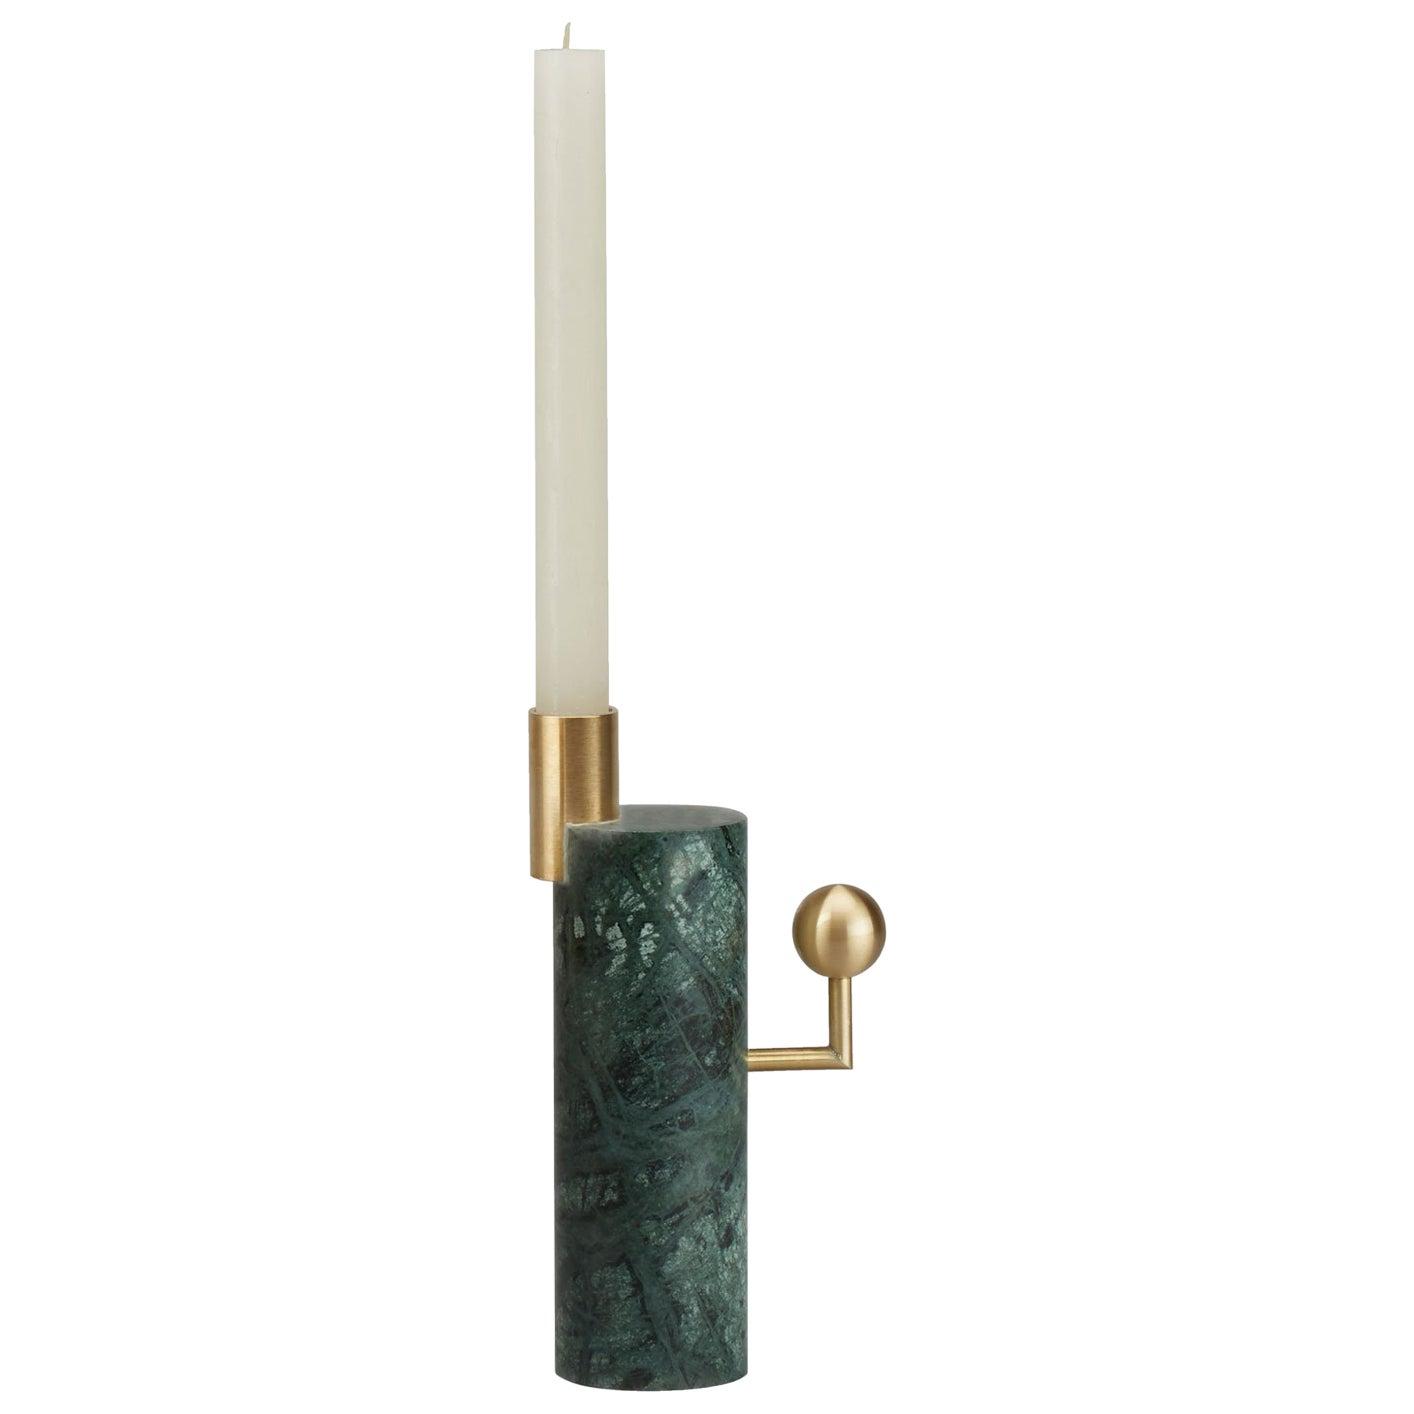 Lara Bohinc, Stargazer Candleholder, Verde Guatemala Marble and Brass, In Stock